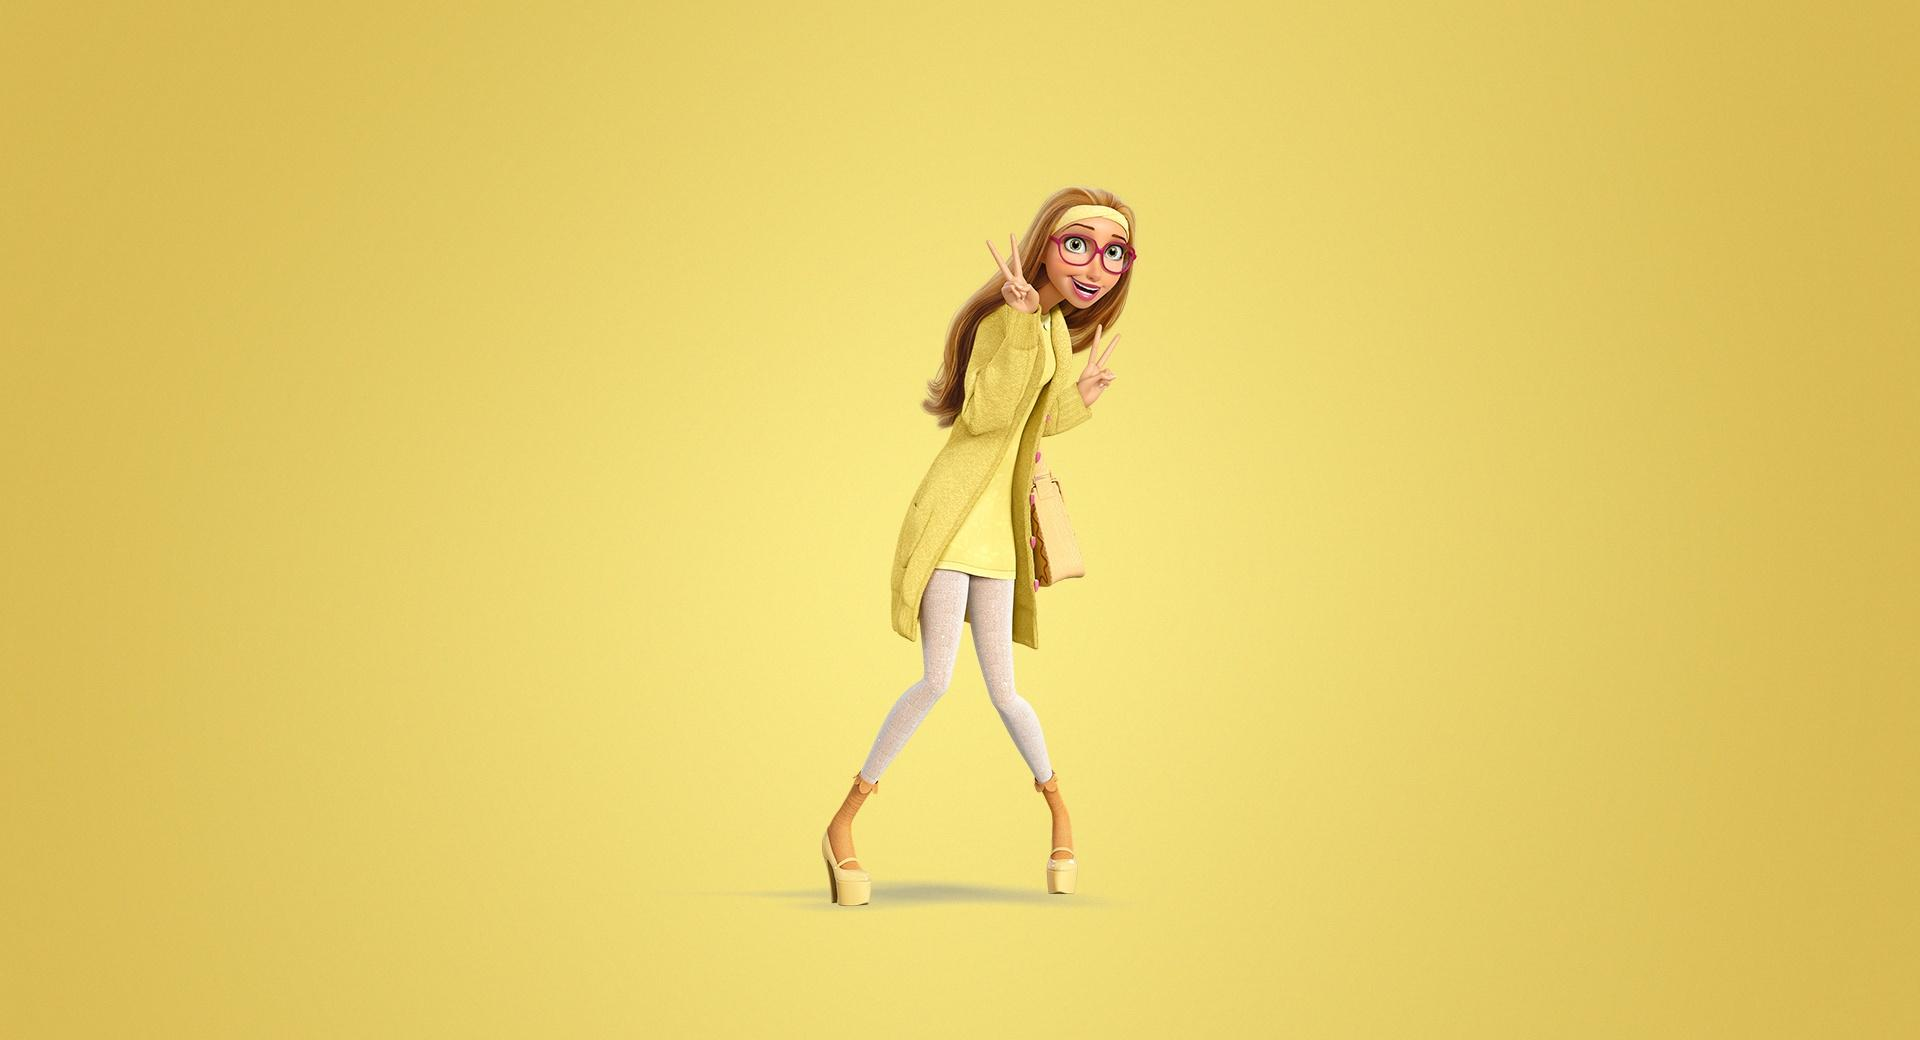 Big Hero 6 Lemon 2014 Movie wallpapers HD quality